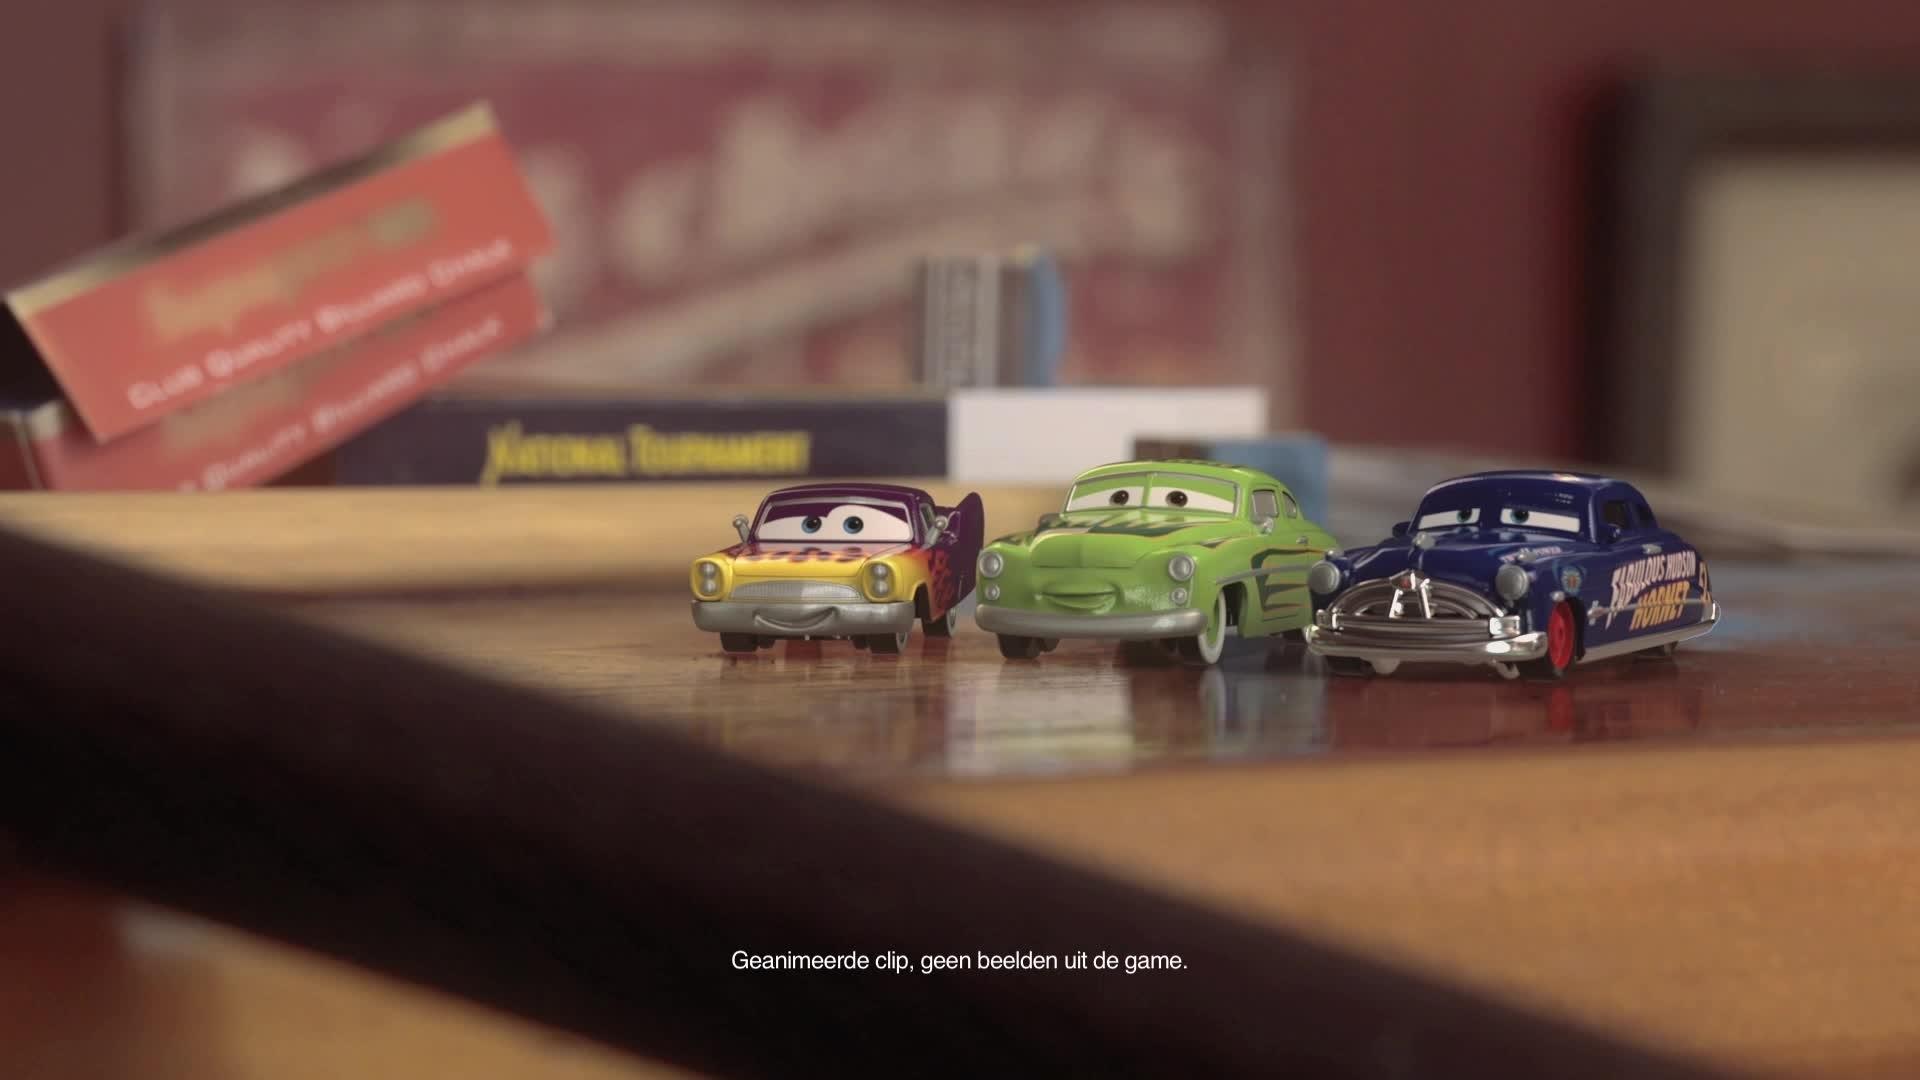 Cars Daredevil Garage - Testrit op de Pooltafel